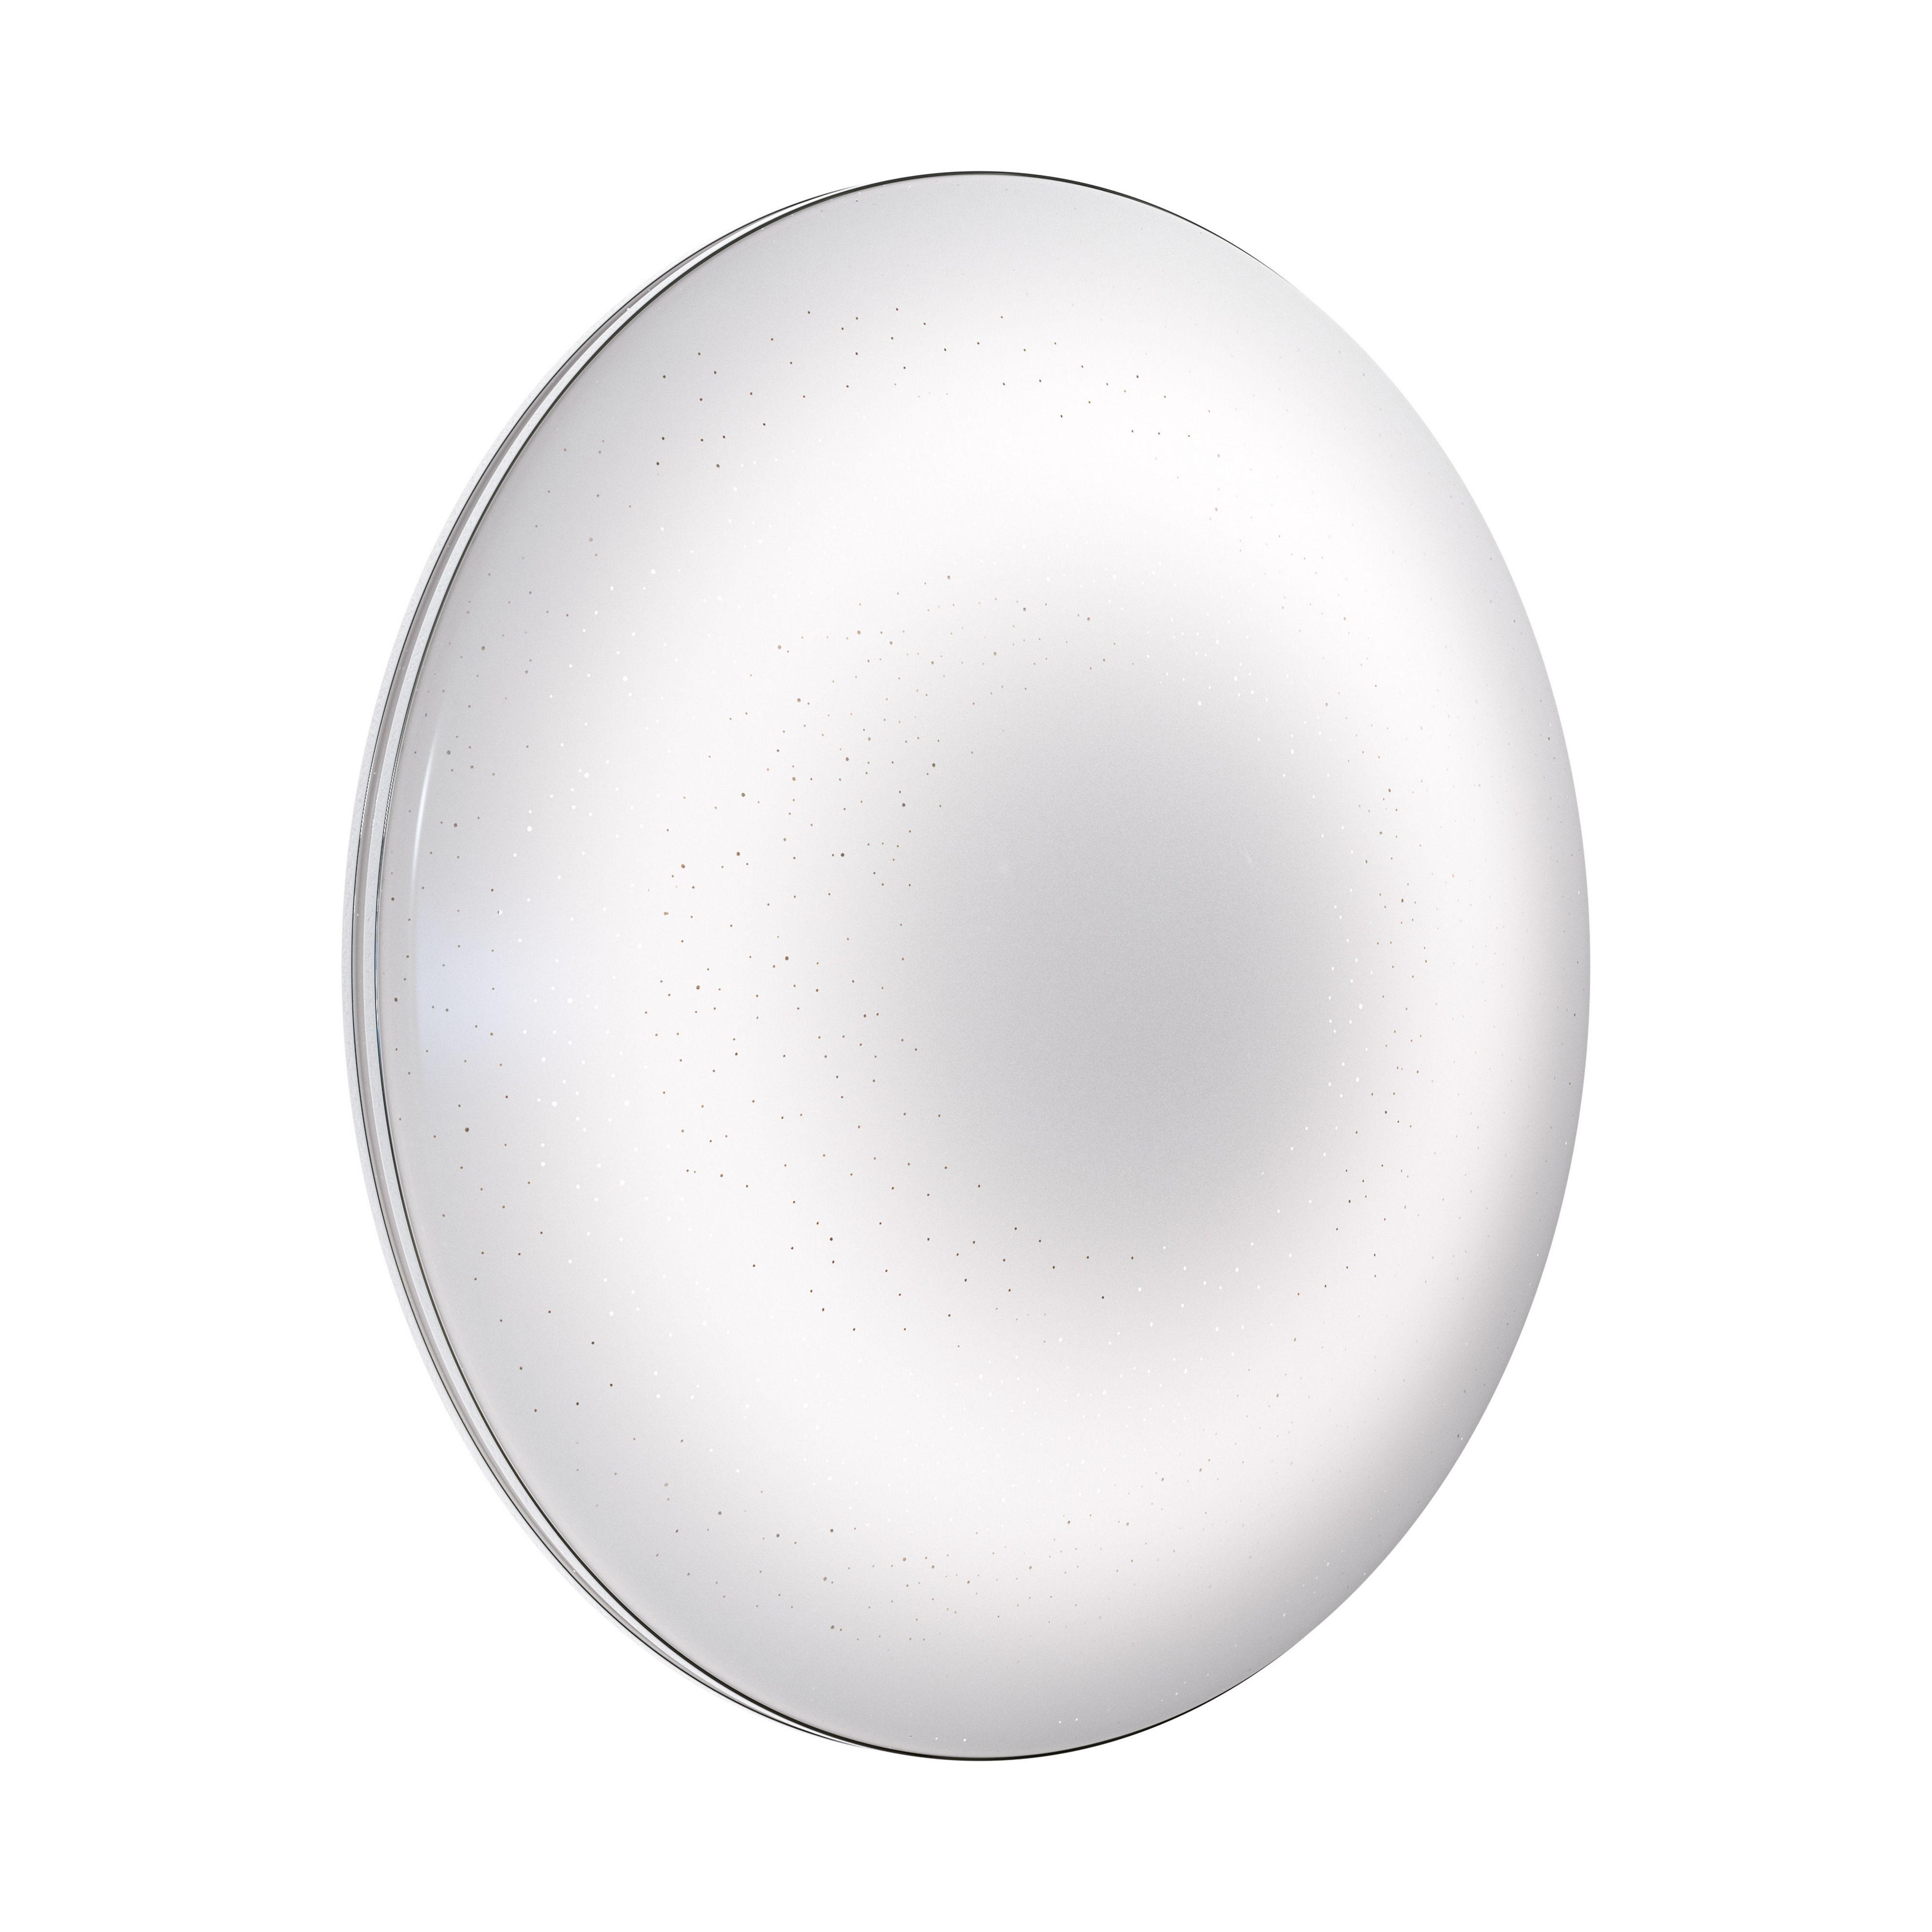 Osram LED-Wand- und Deckenleuchte, dimmbar »SILARA SPARKLE 450 24 W 827-865 Click-CCT«